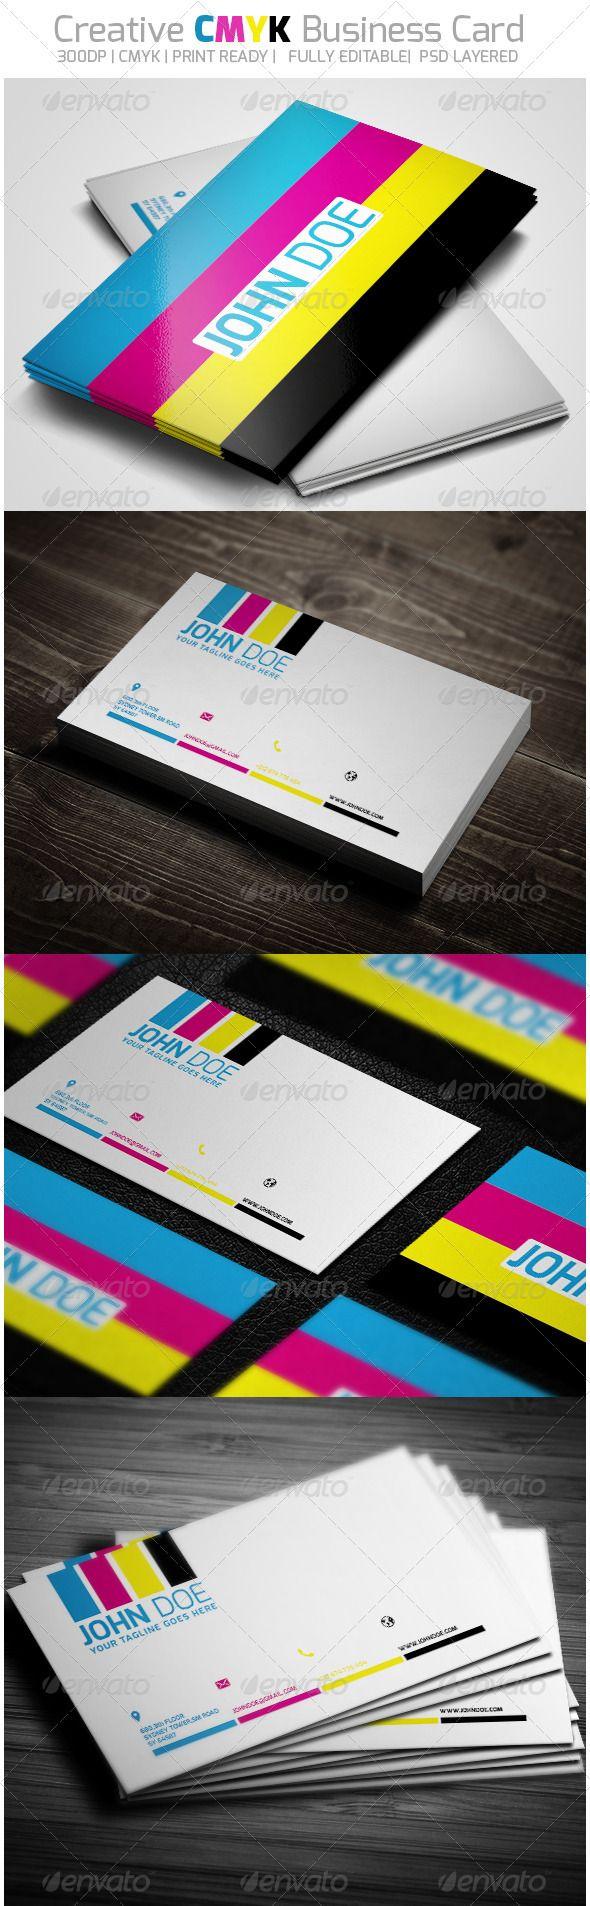 7 best design business cards images on pinterest fonts bright creative cmyk business card magicingreecefo Images